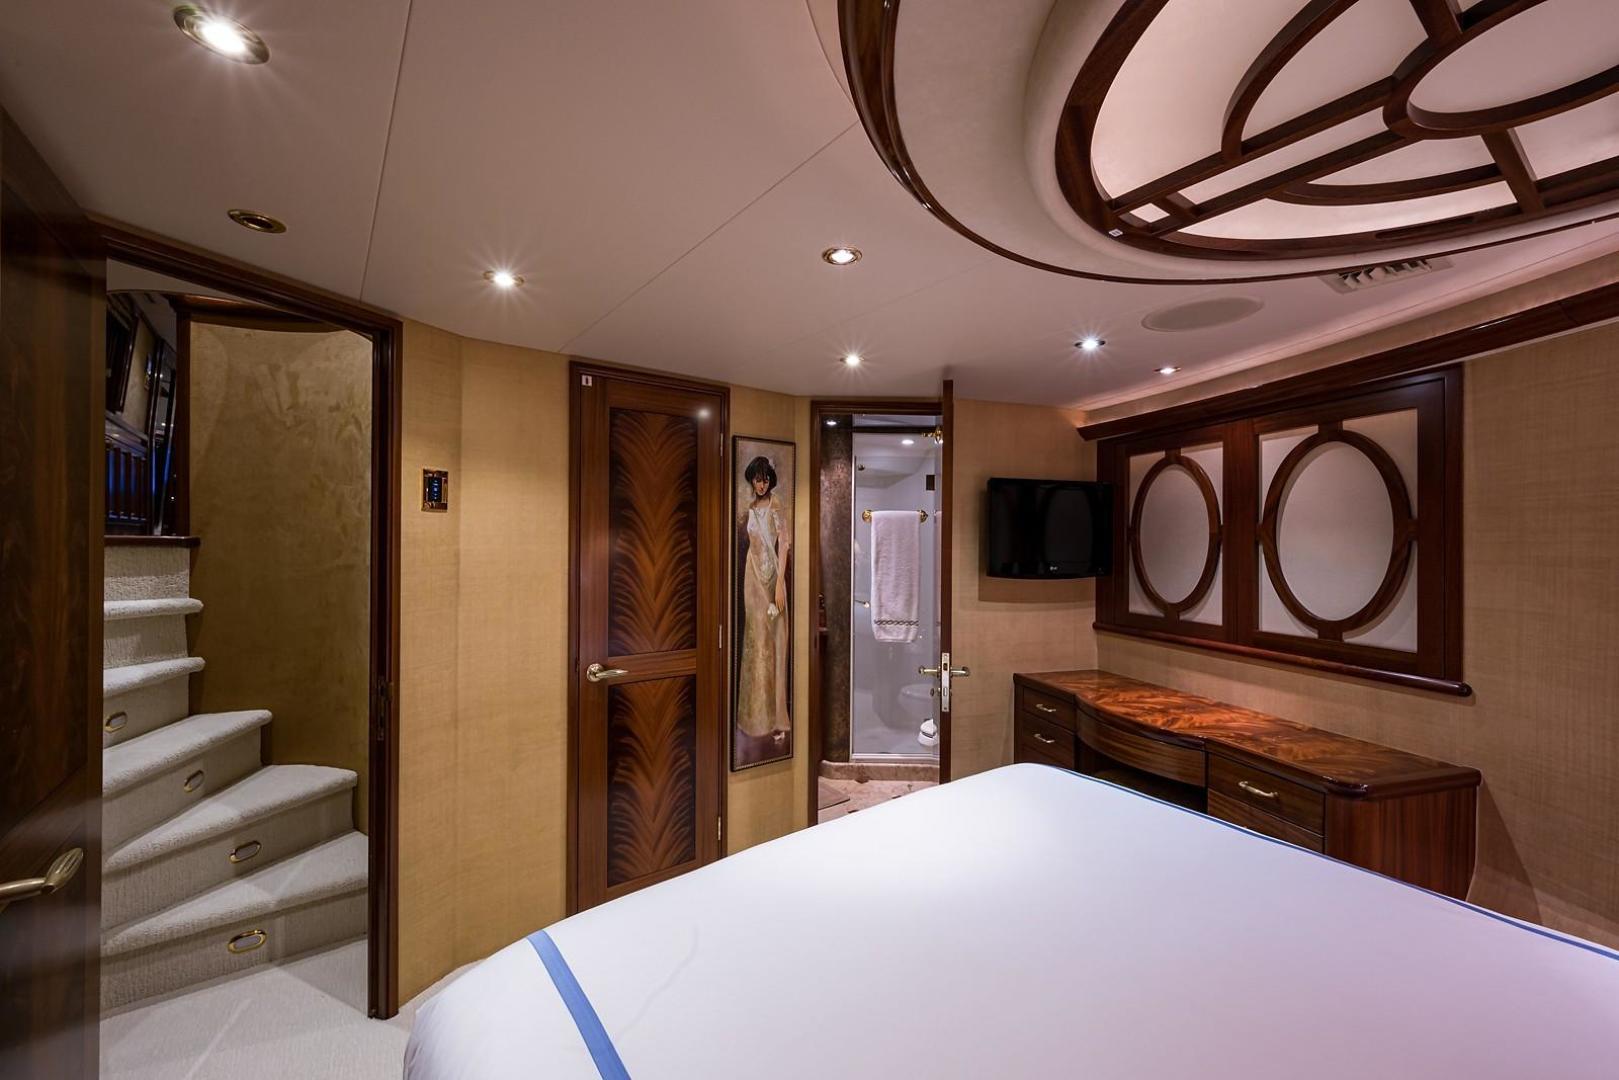 Westport-Motoryacht 2010-Cavallino Fort Lauderdale-Florida-United States-VIP Stateroom-1270098 | Thumbnail